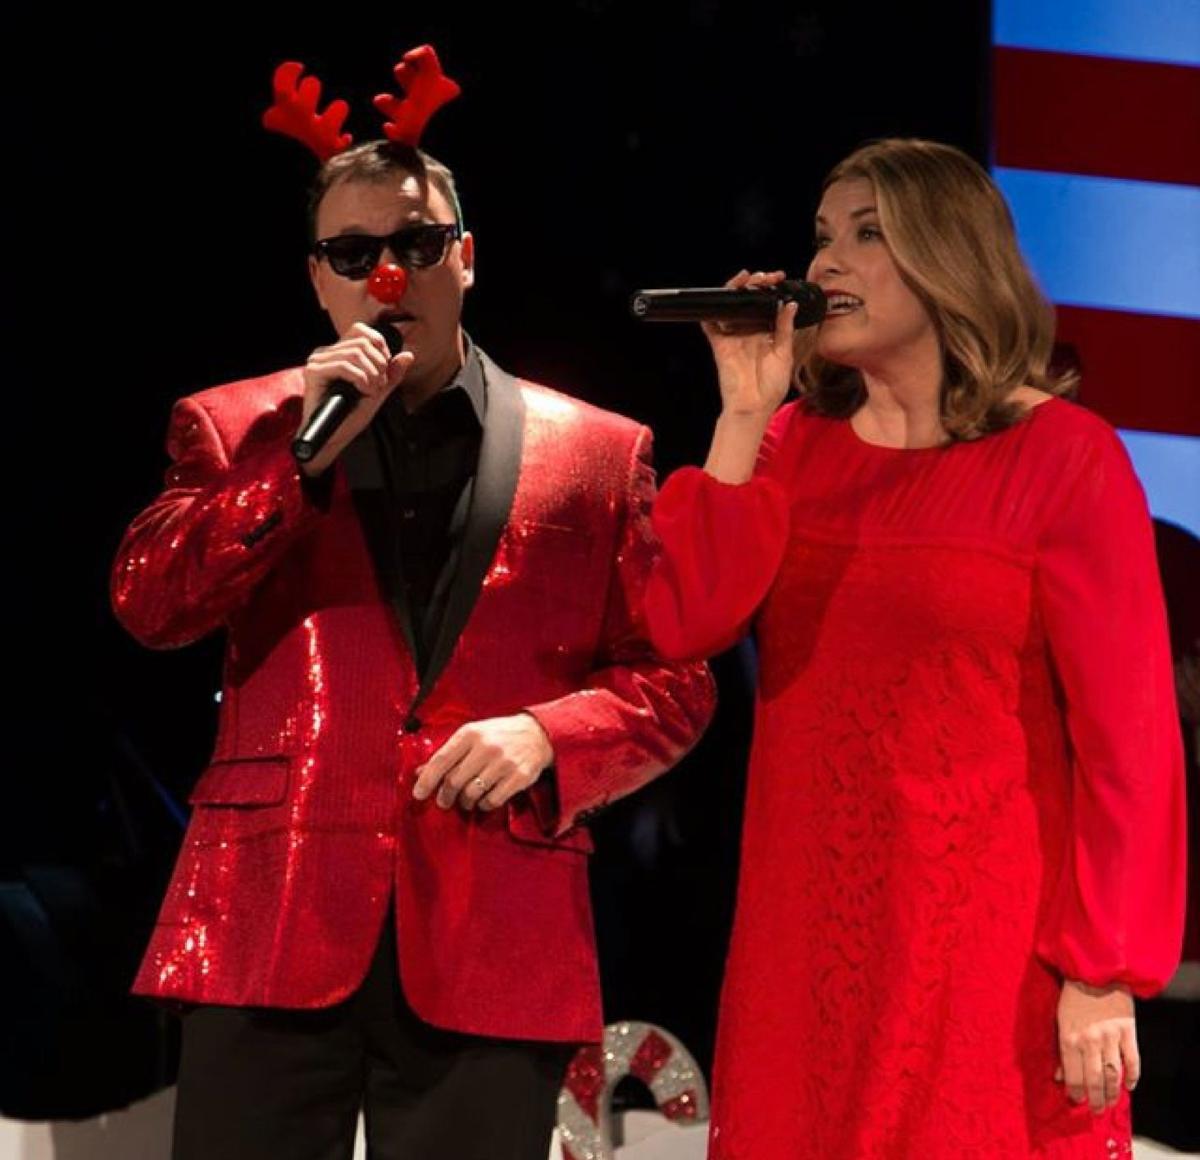 121119_PNN_Paulding_Christmas_Events1